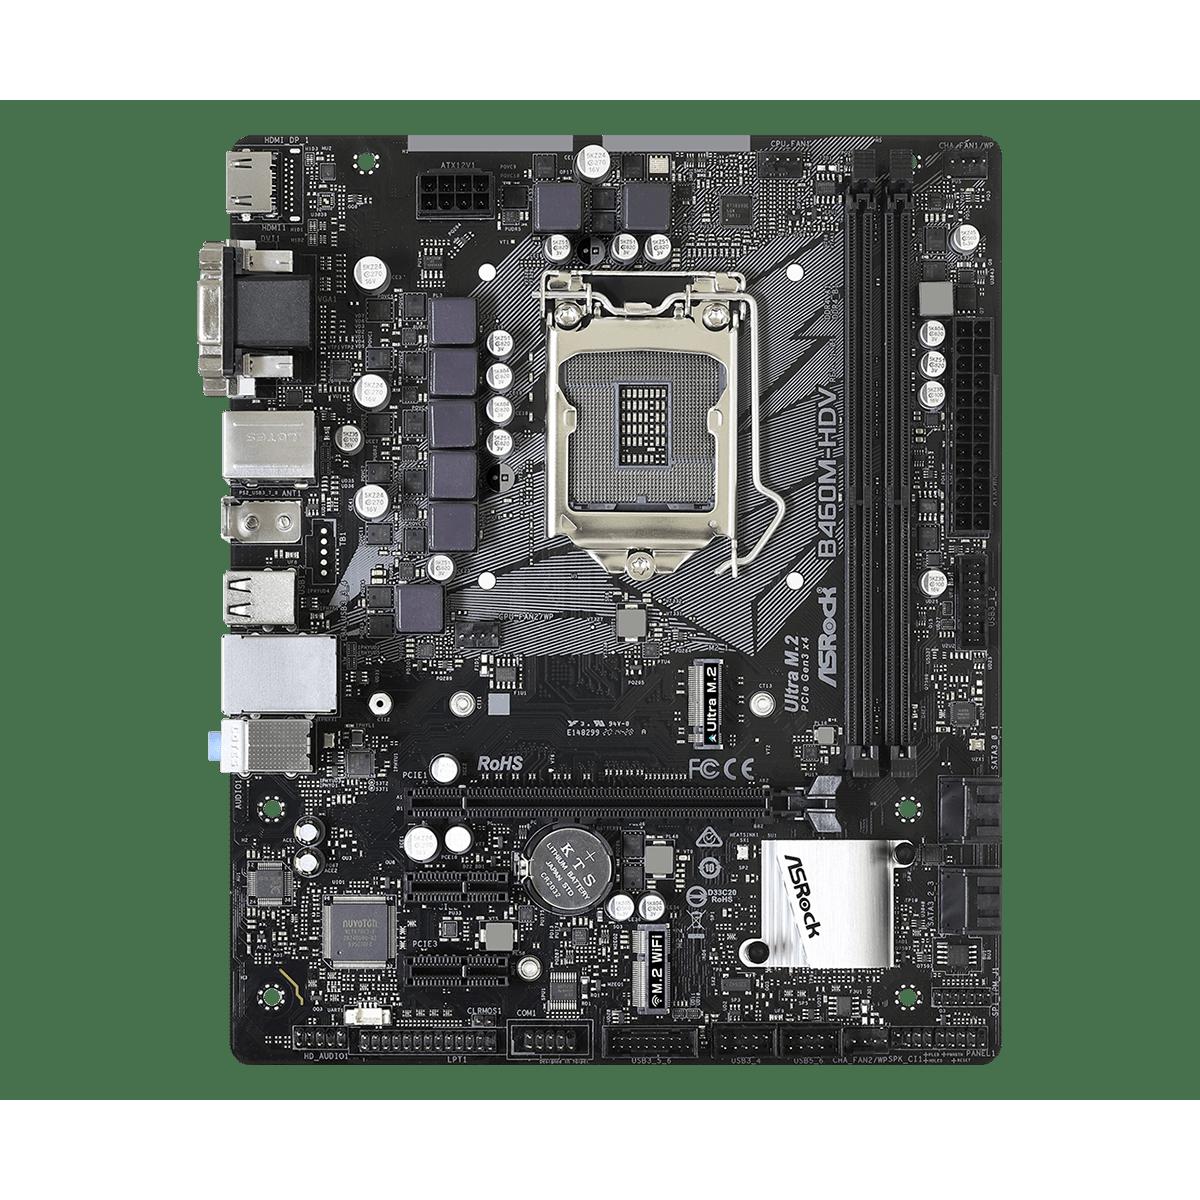 Placa Mãe AsRock B460M-HDV, Chipset B460M, Intel LGA 1200, mATX, DDR4, 90-MXBD30-A0UAYZ - Open Box